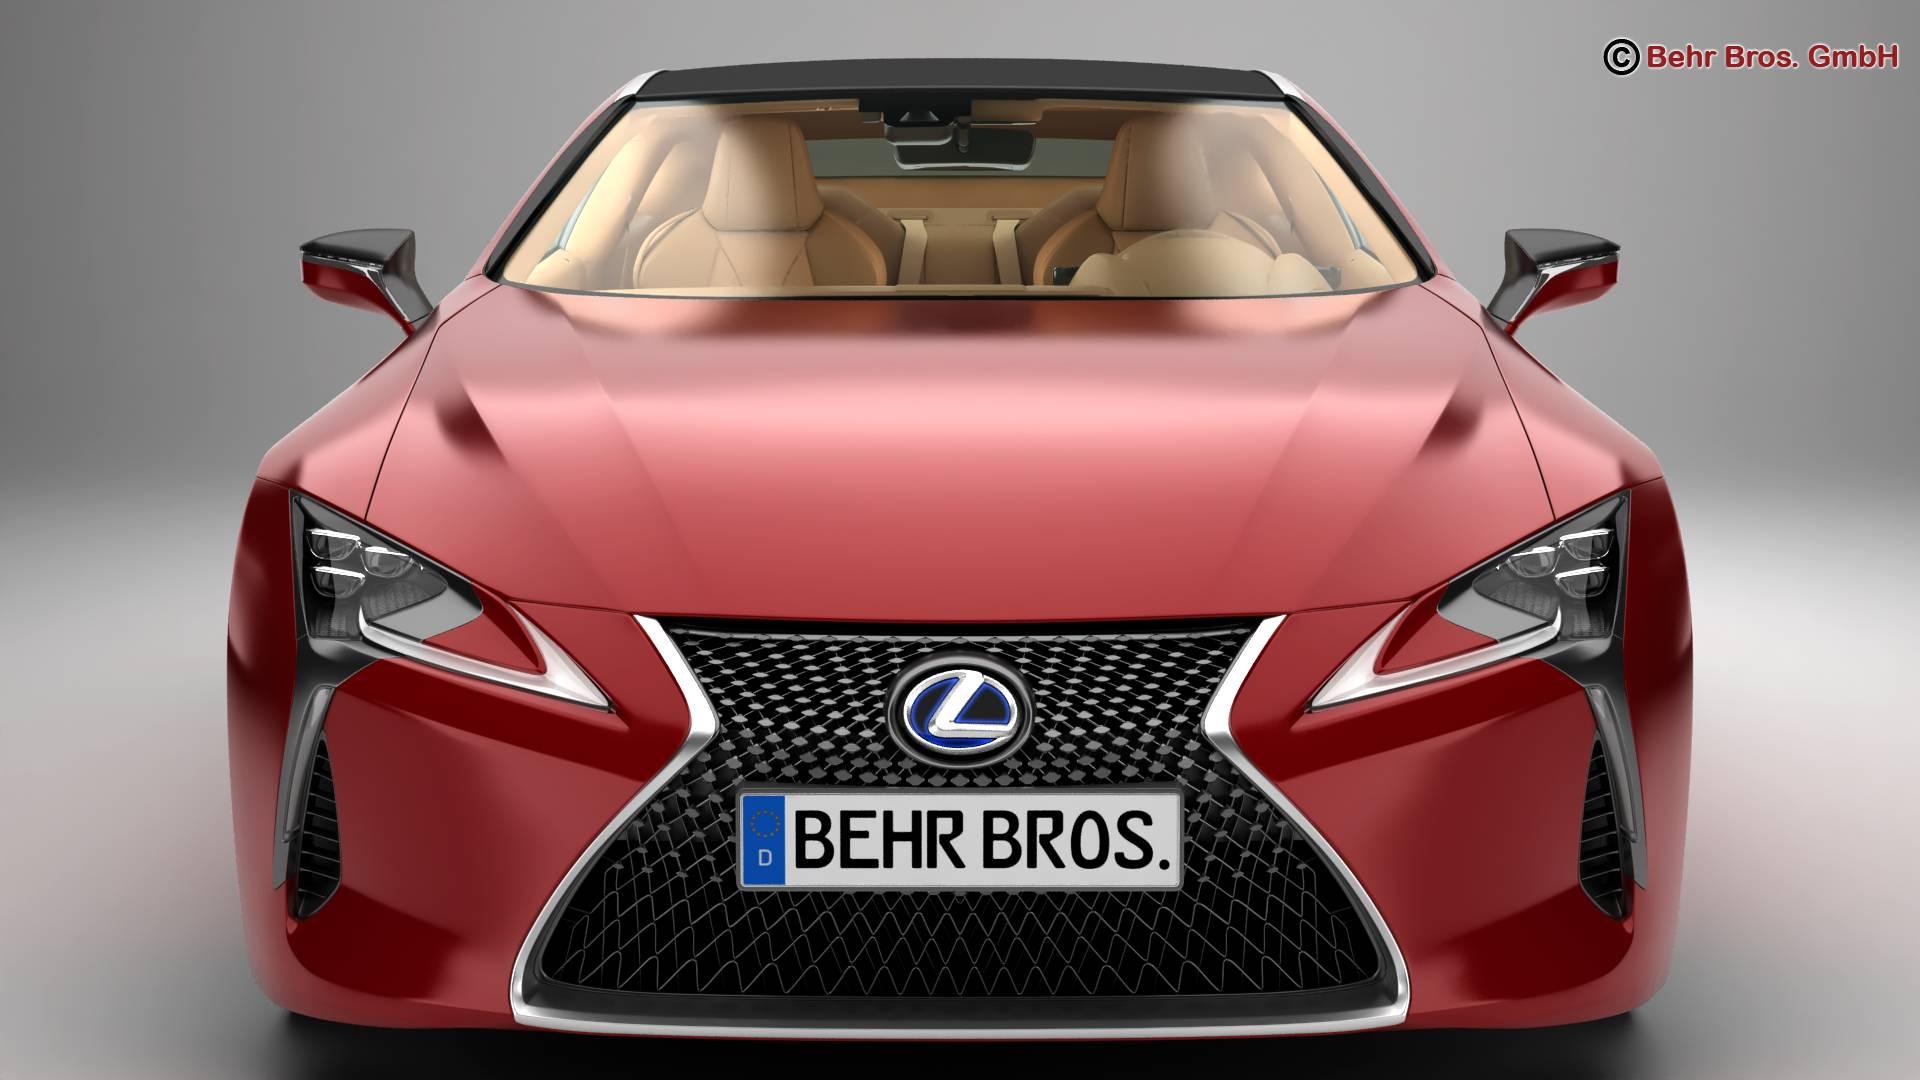 lexus lc 500 us hybrid 2018 3d model 3ds max fbx c4d lwo ma mb obj 267927